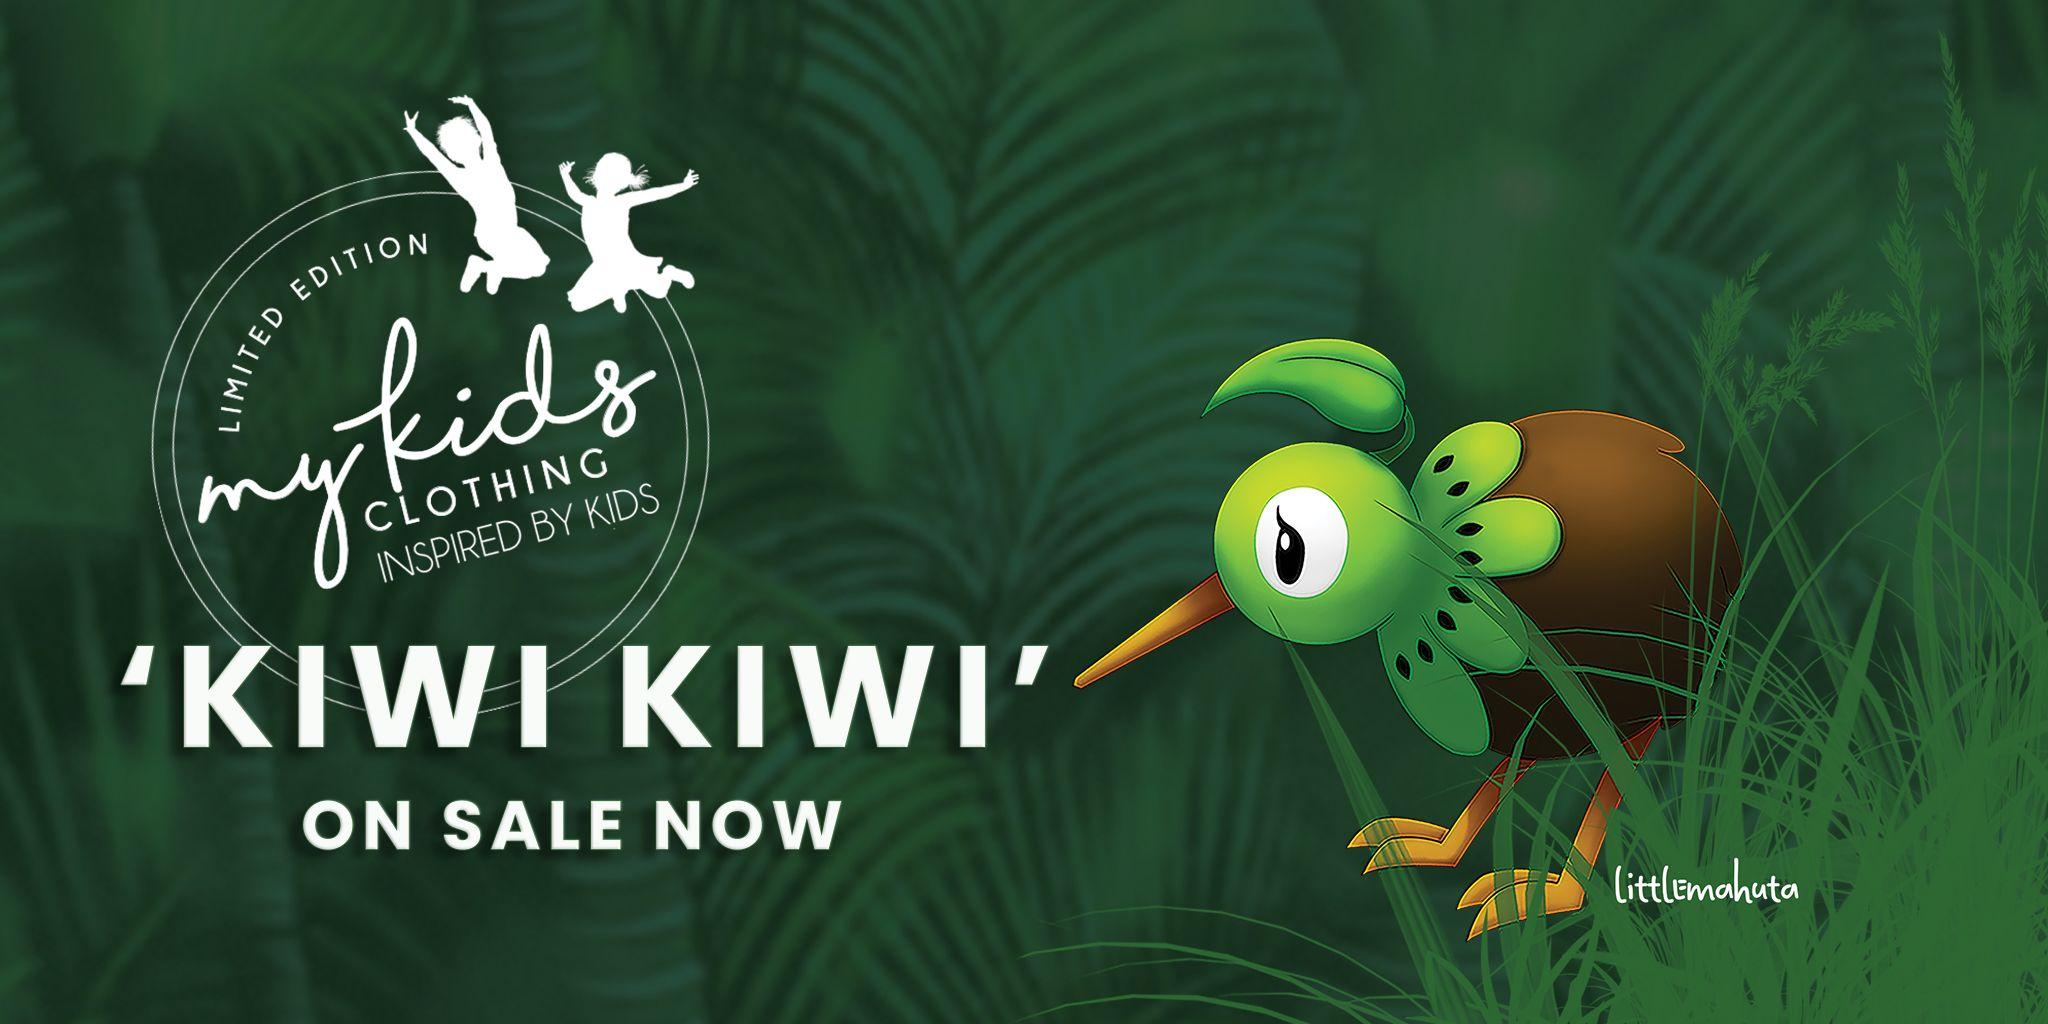 KiwiKiwi Collection - 100% Cotton Tees - Size: Newborn - AdultGiclee PrintsGift Sets